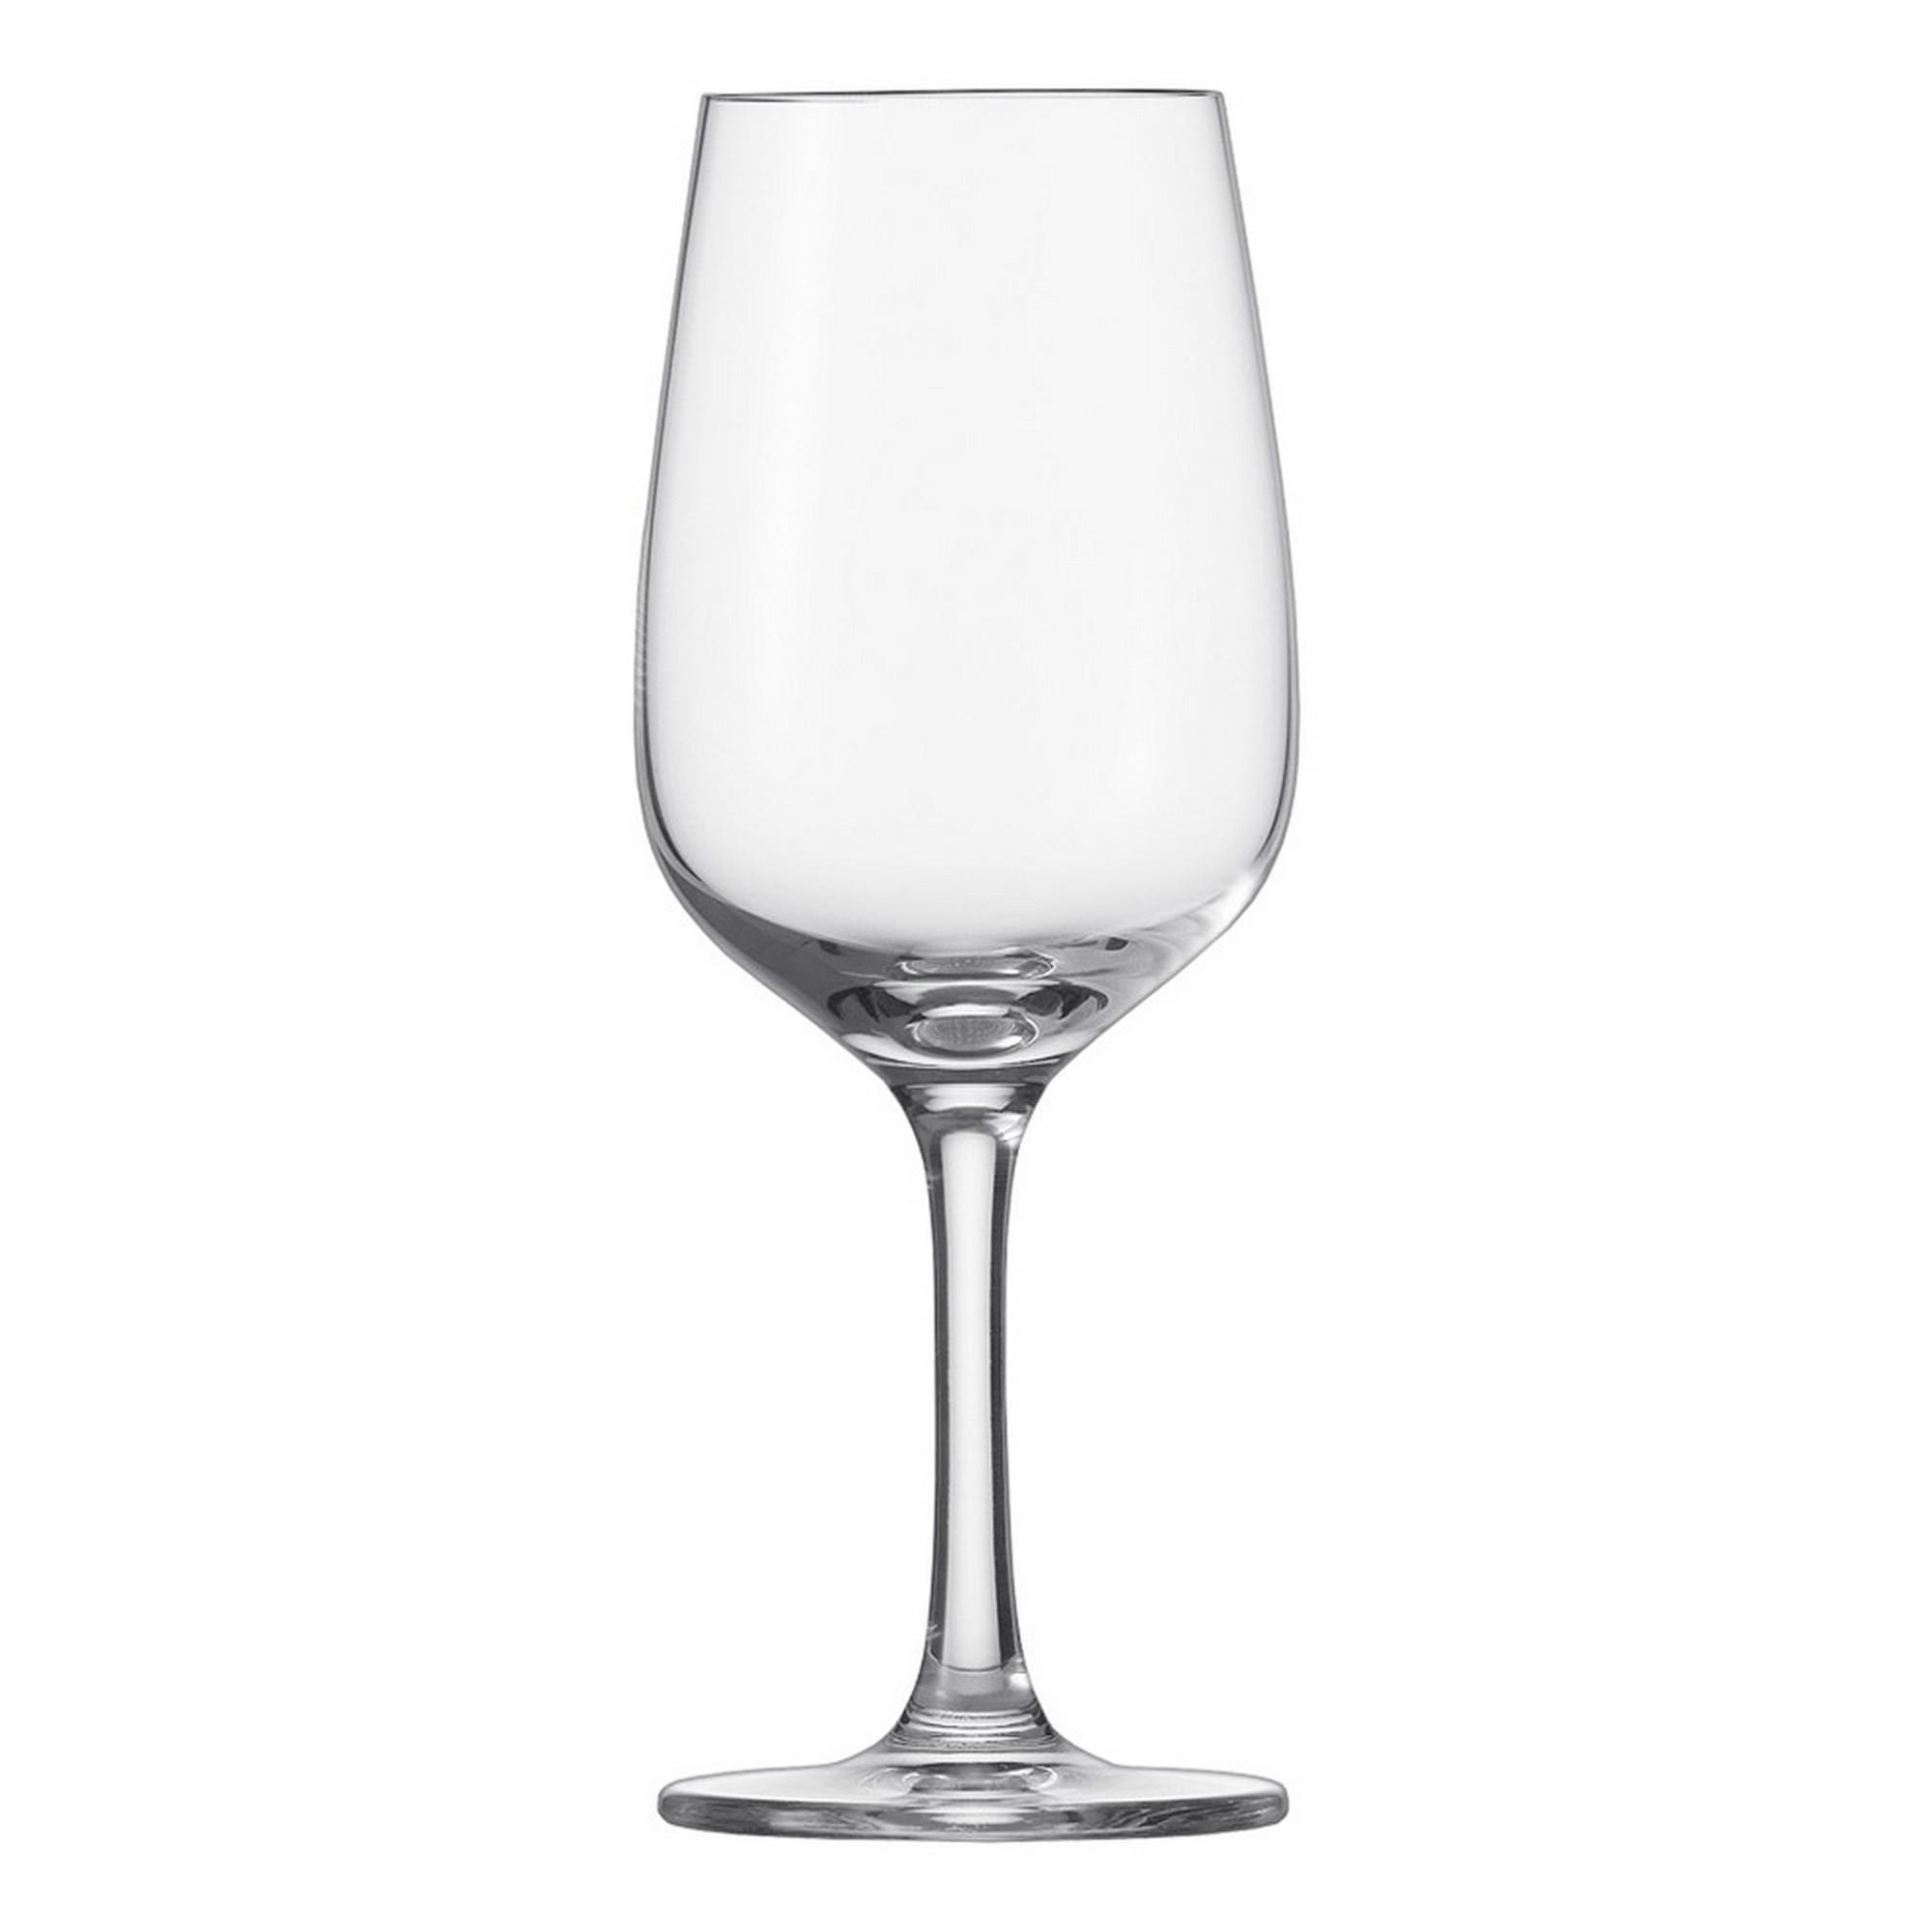 Taça para Vinho Tinto 355ml Schott Zwiesel Congresso 6 Peças de Cristal